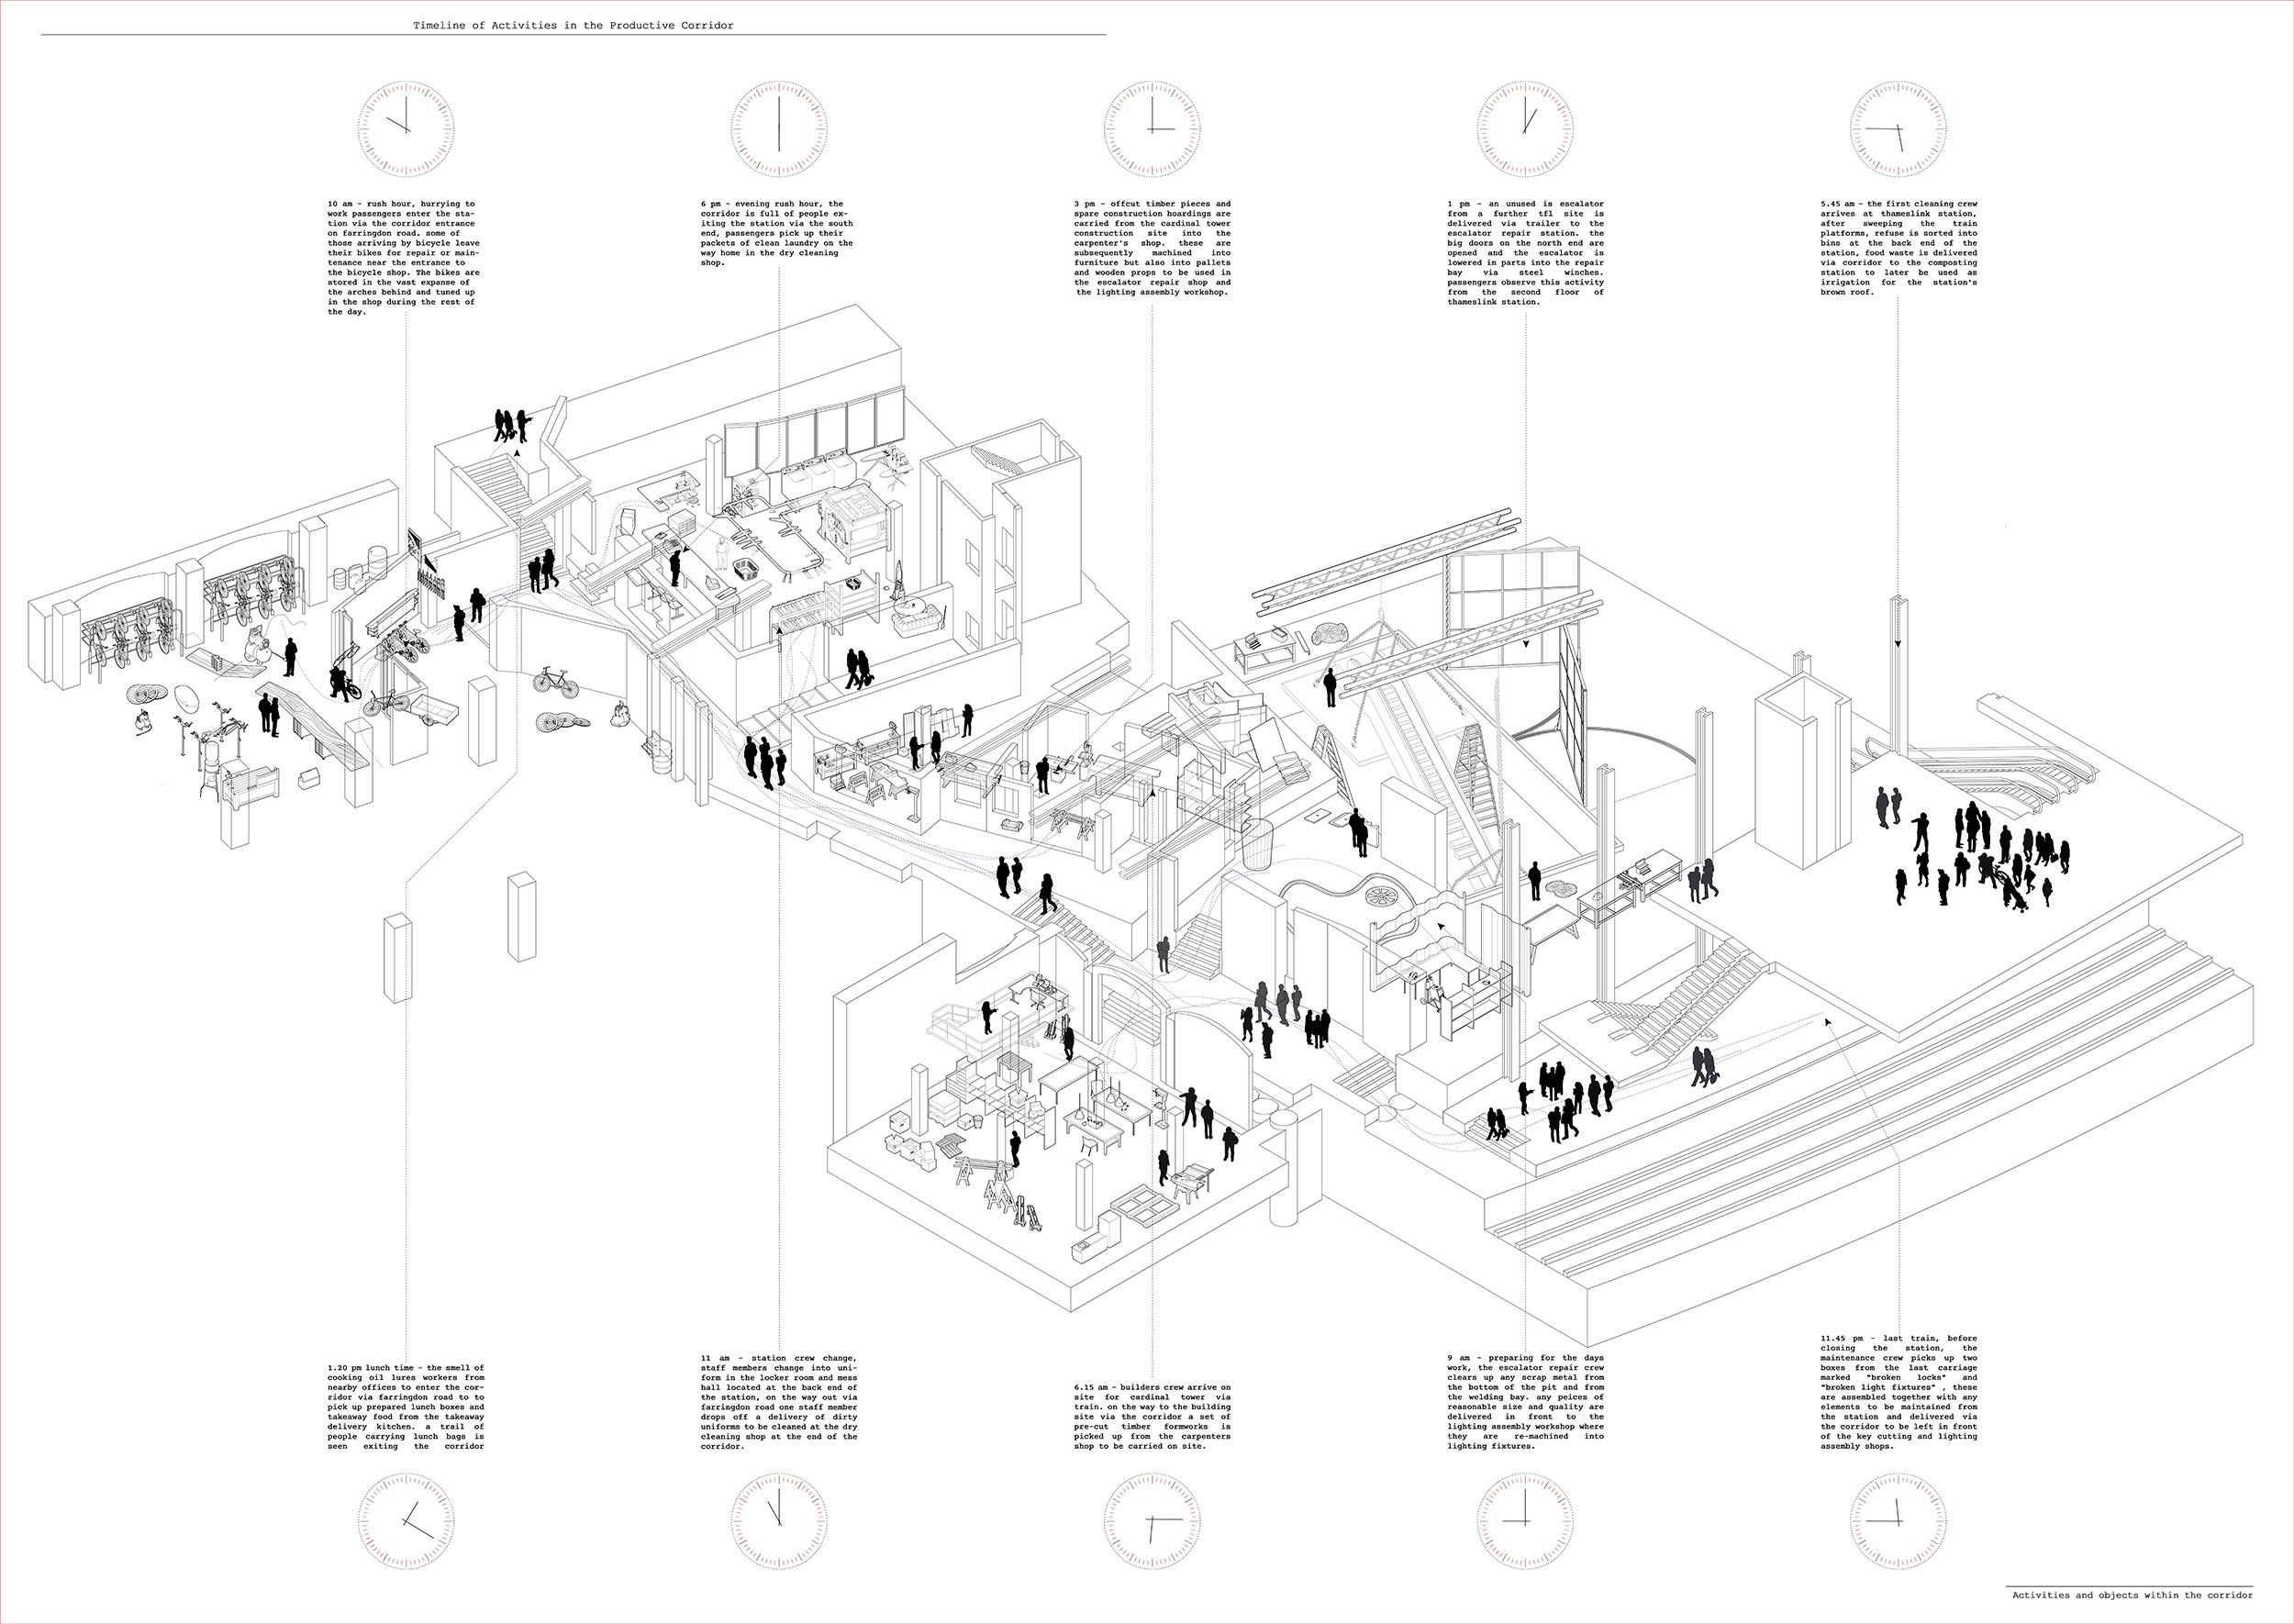 pin by huai kuan chung on diagram